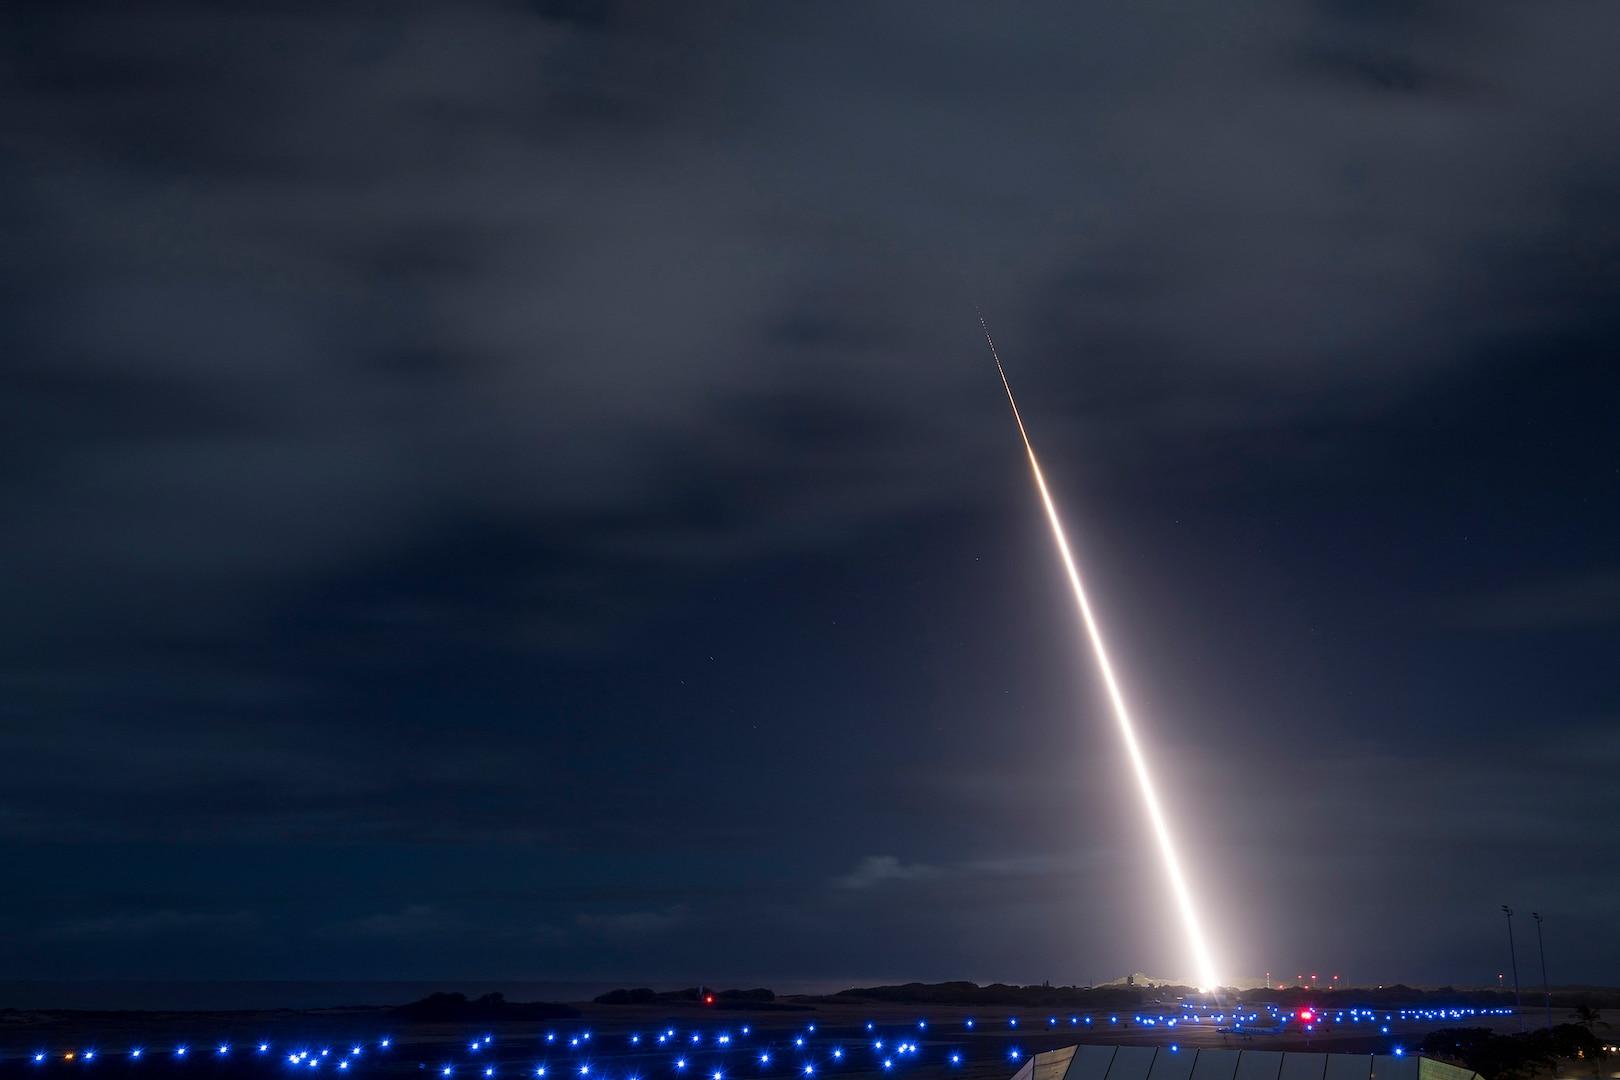 U.S. Successfully Conducts SM-3 Block IIA Intercept Test